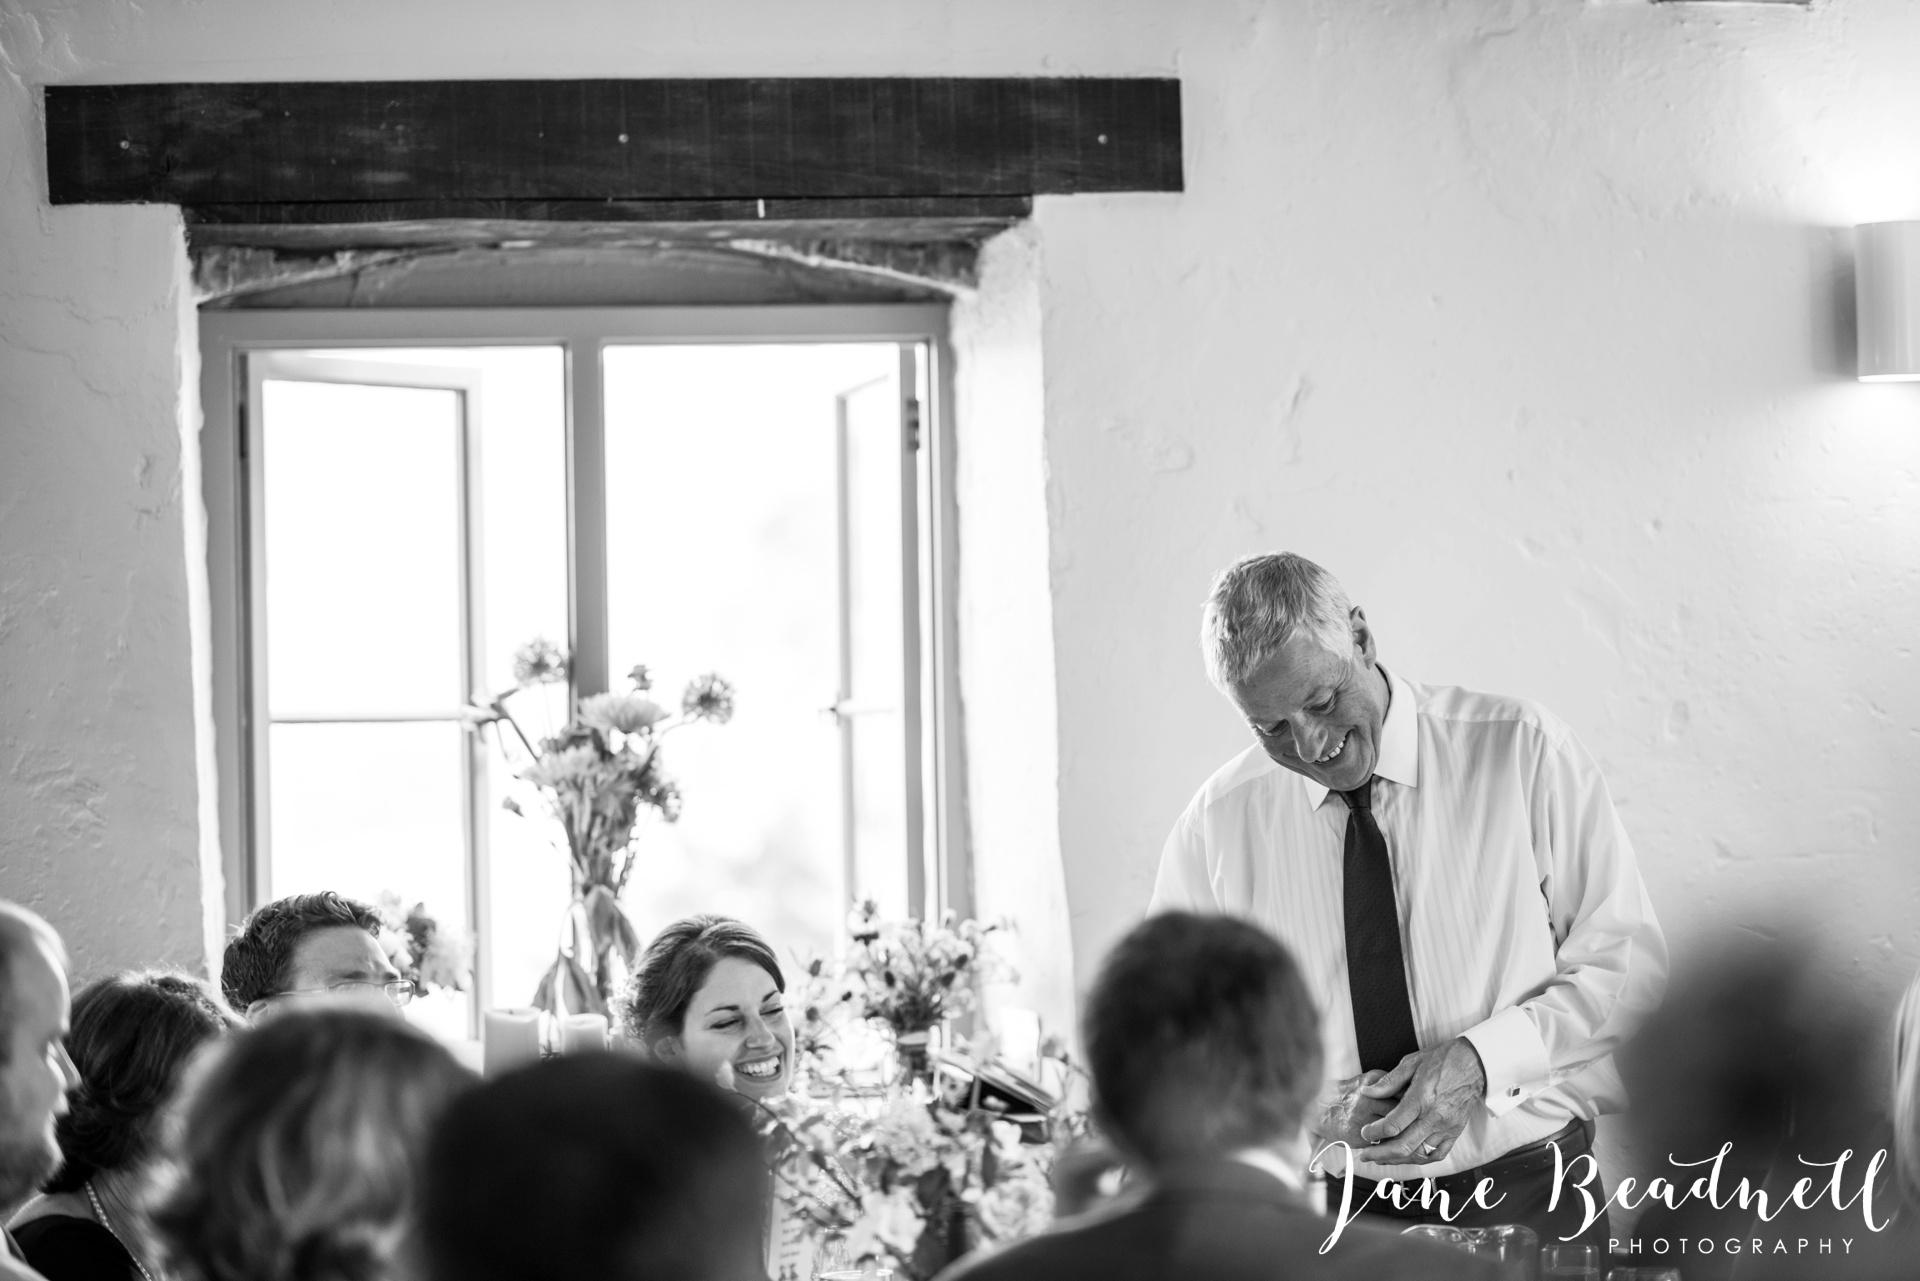 Bath Abbey wedding photography by fine art wedding photographer Leeds Jane Beadnell_55